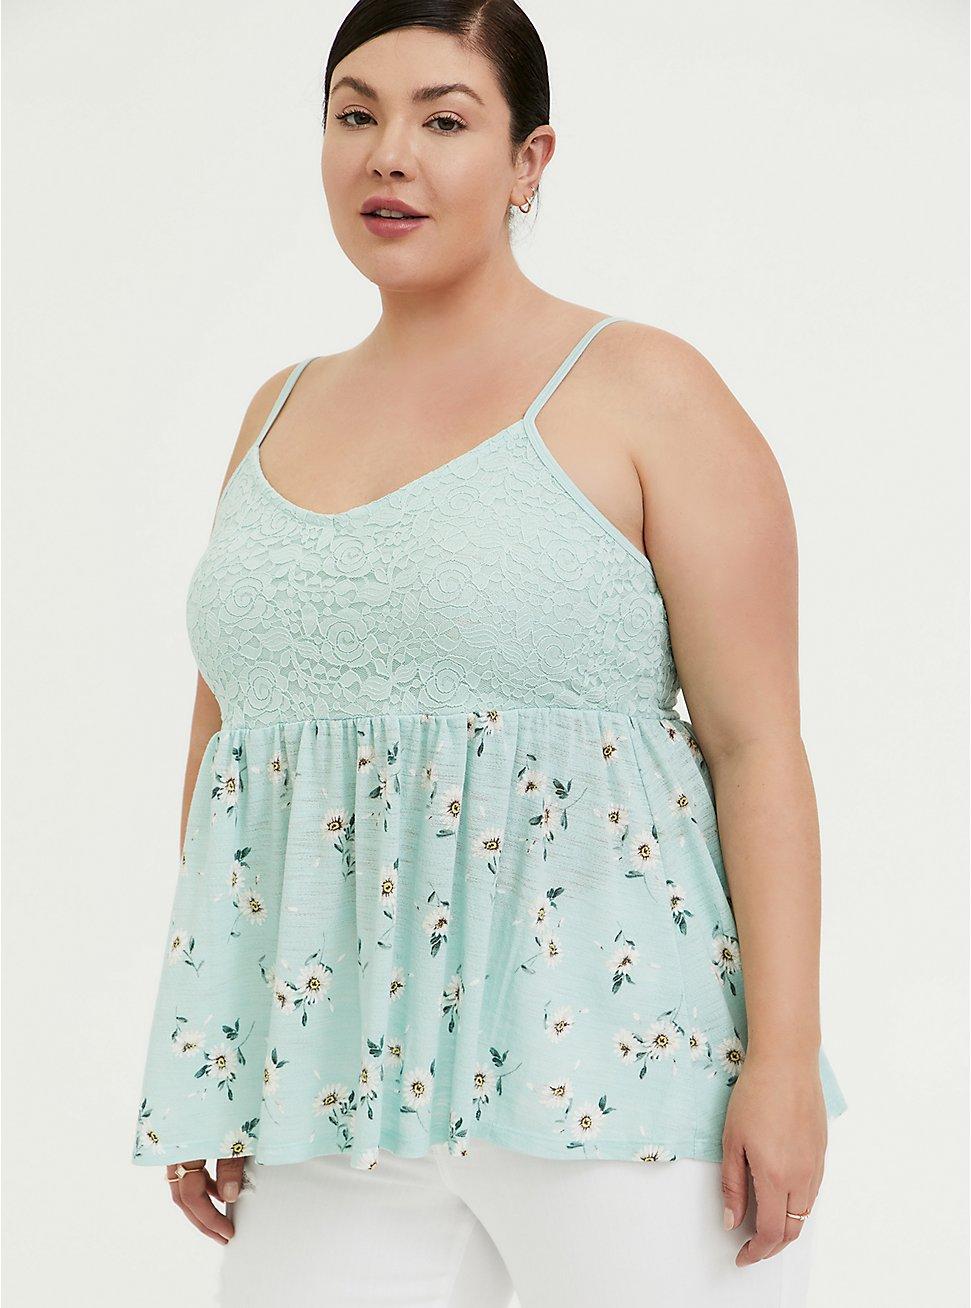 Mint Blue Floral Slub Jersey & Lace Babydoll Cami, FLORAL - GREEN, hi-res